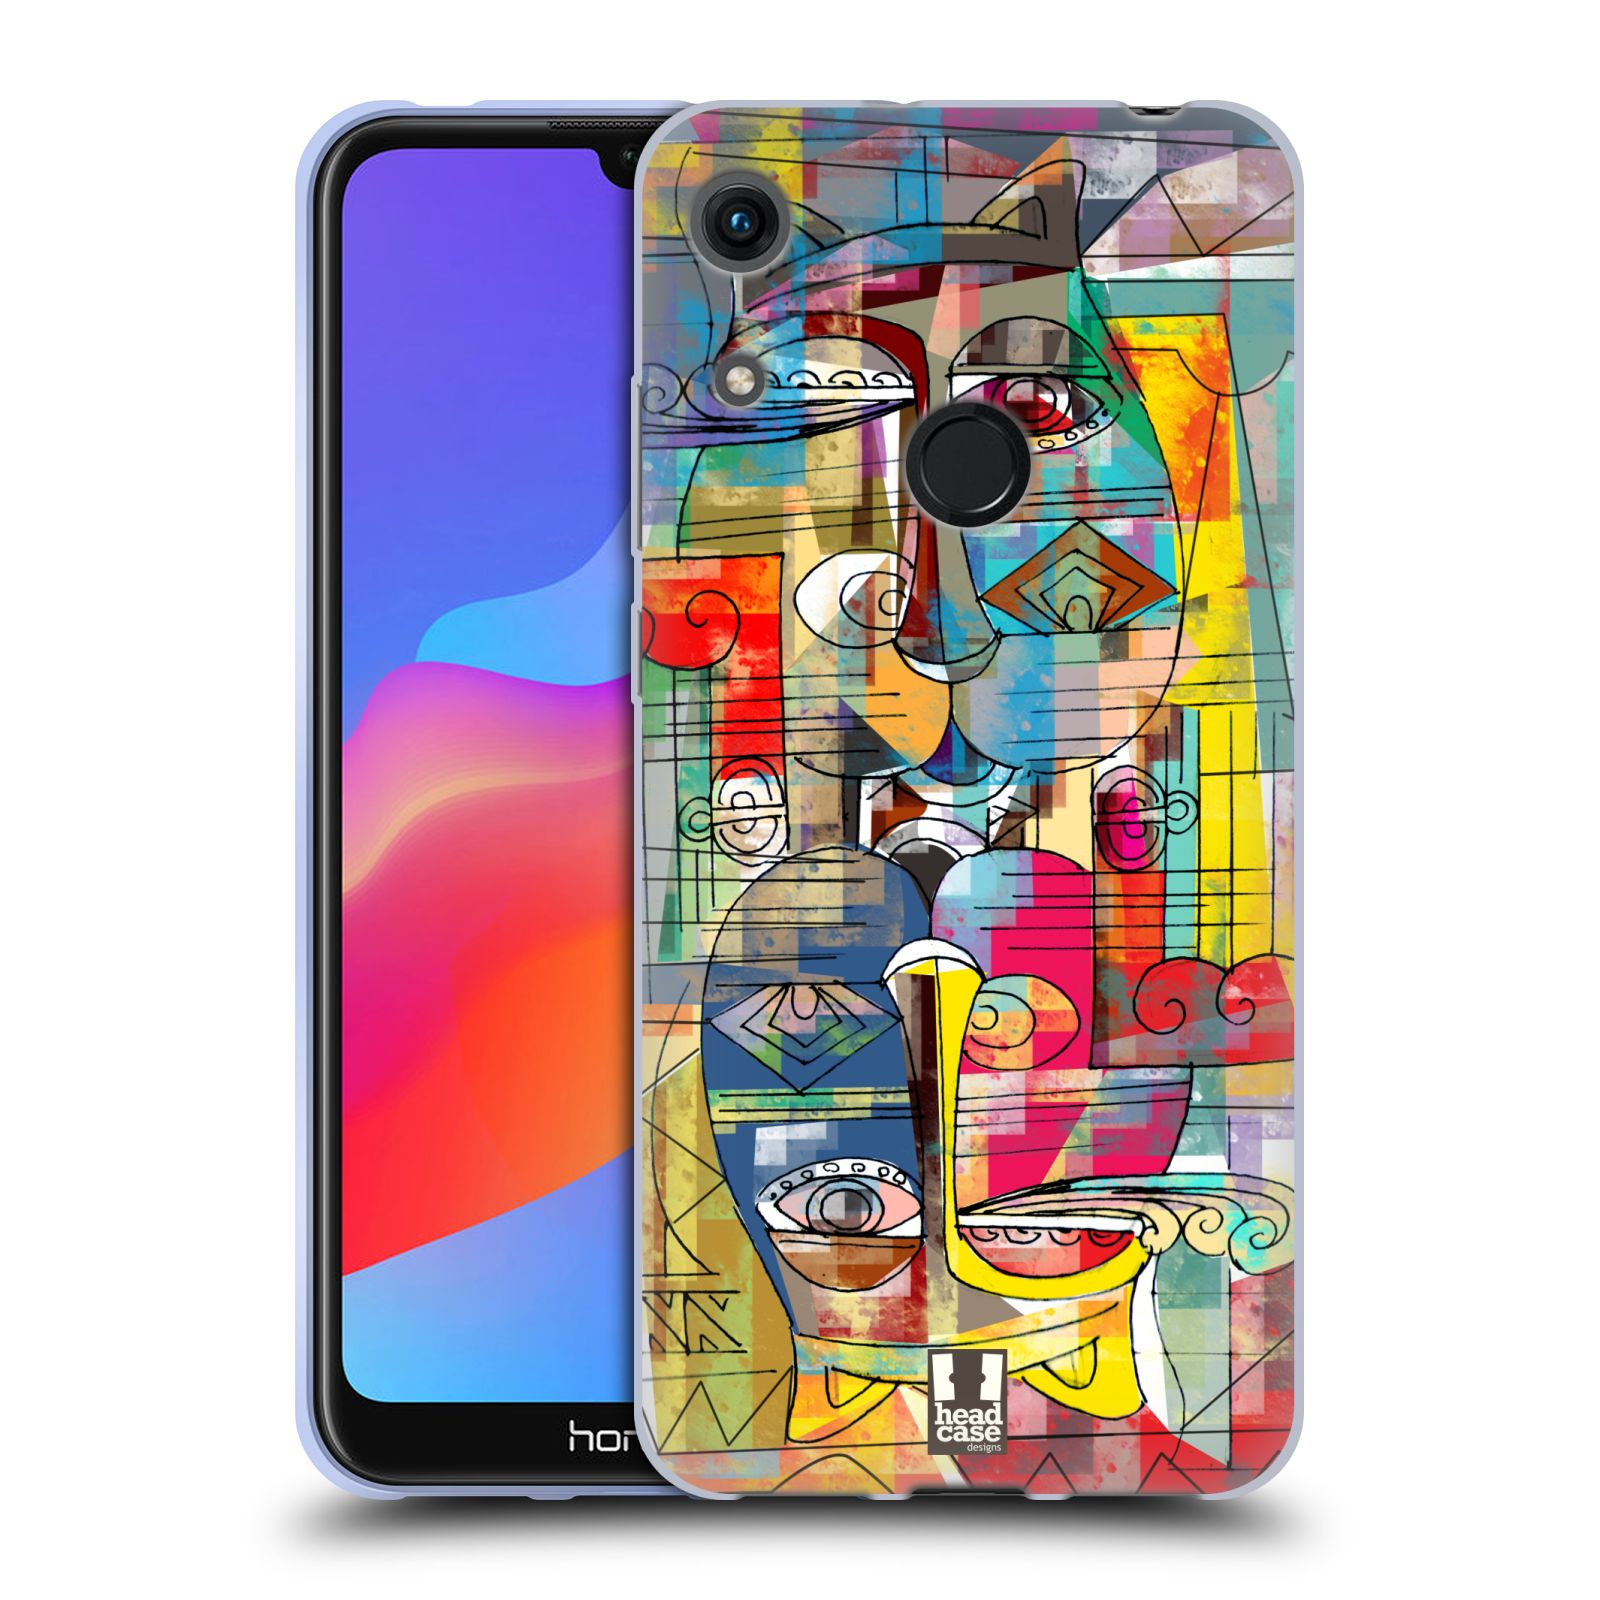 Silikonové pouzdro na mobil Honor 8A - Head Case - AZTEC MANX